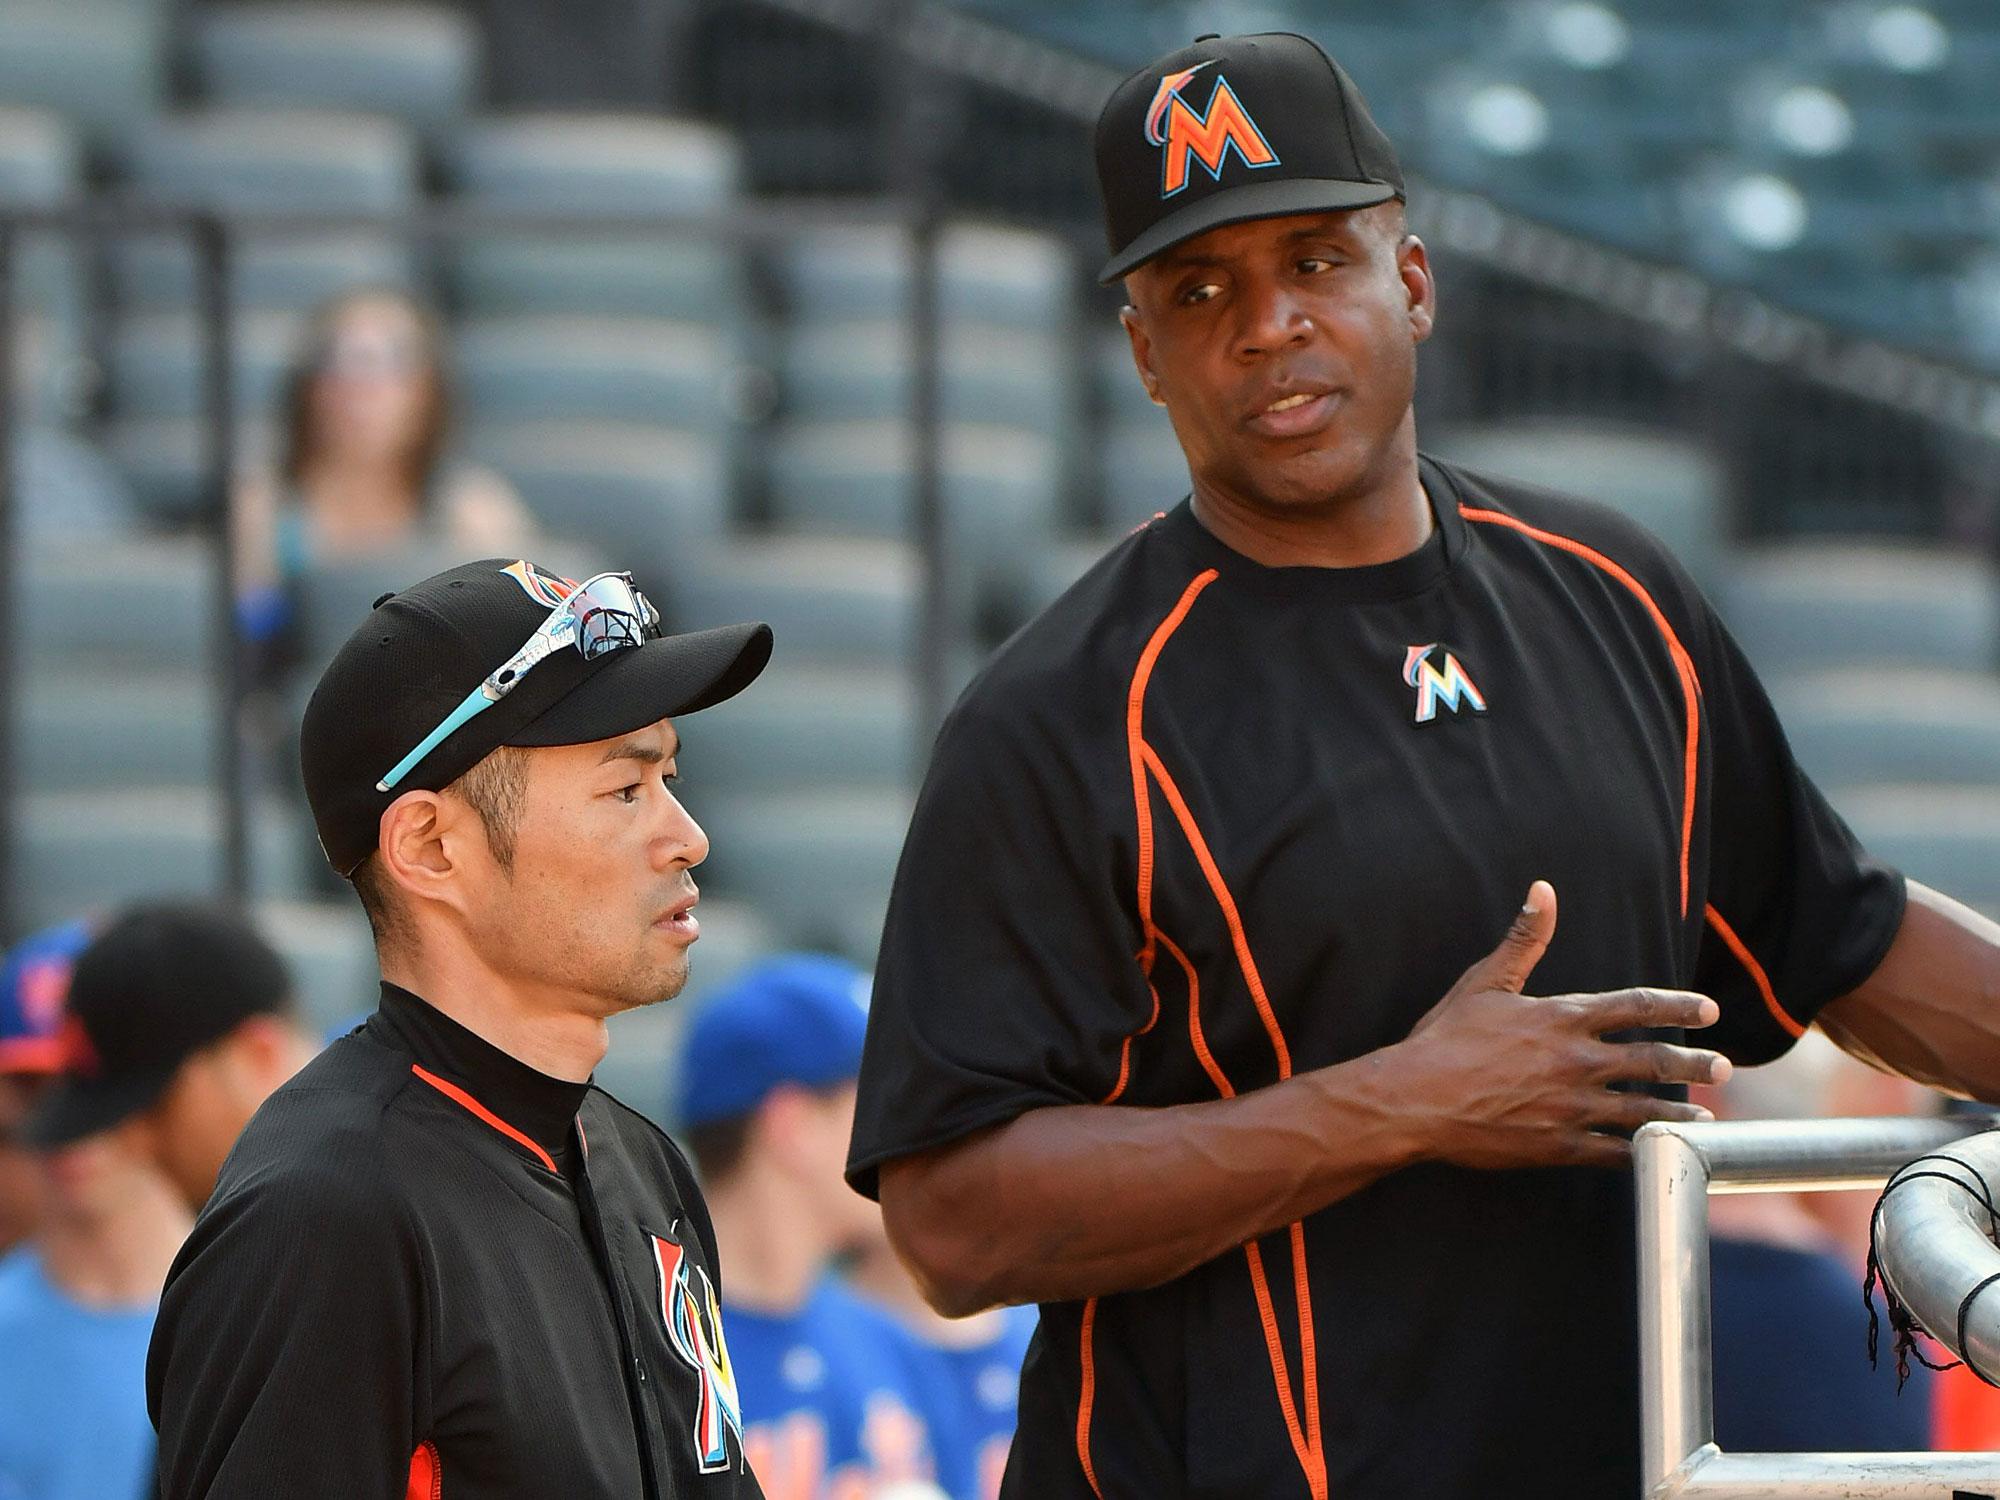 ichiro Suzuki and Barry Bonds, Miami Marlins